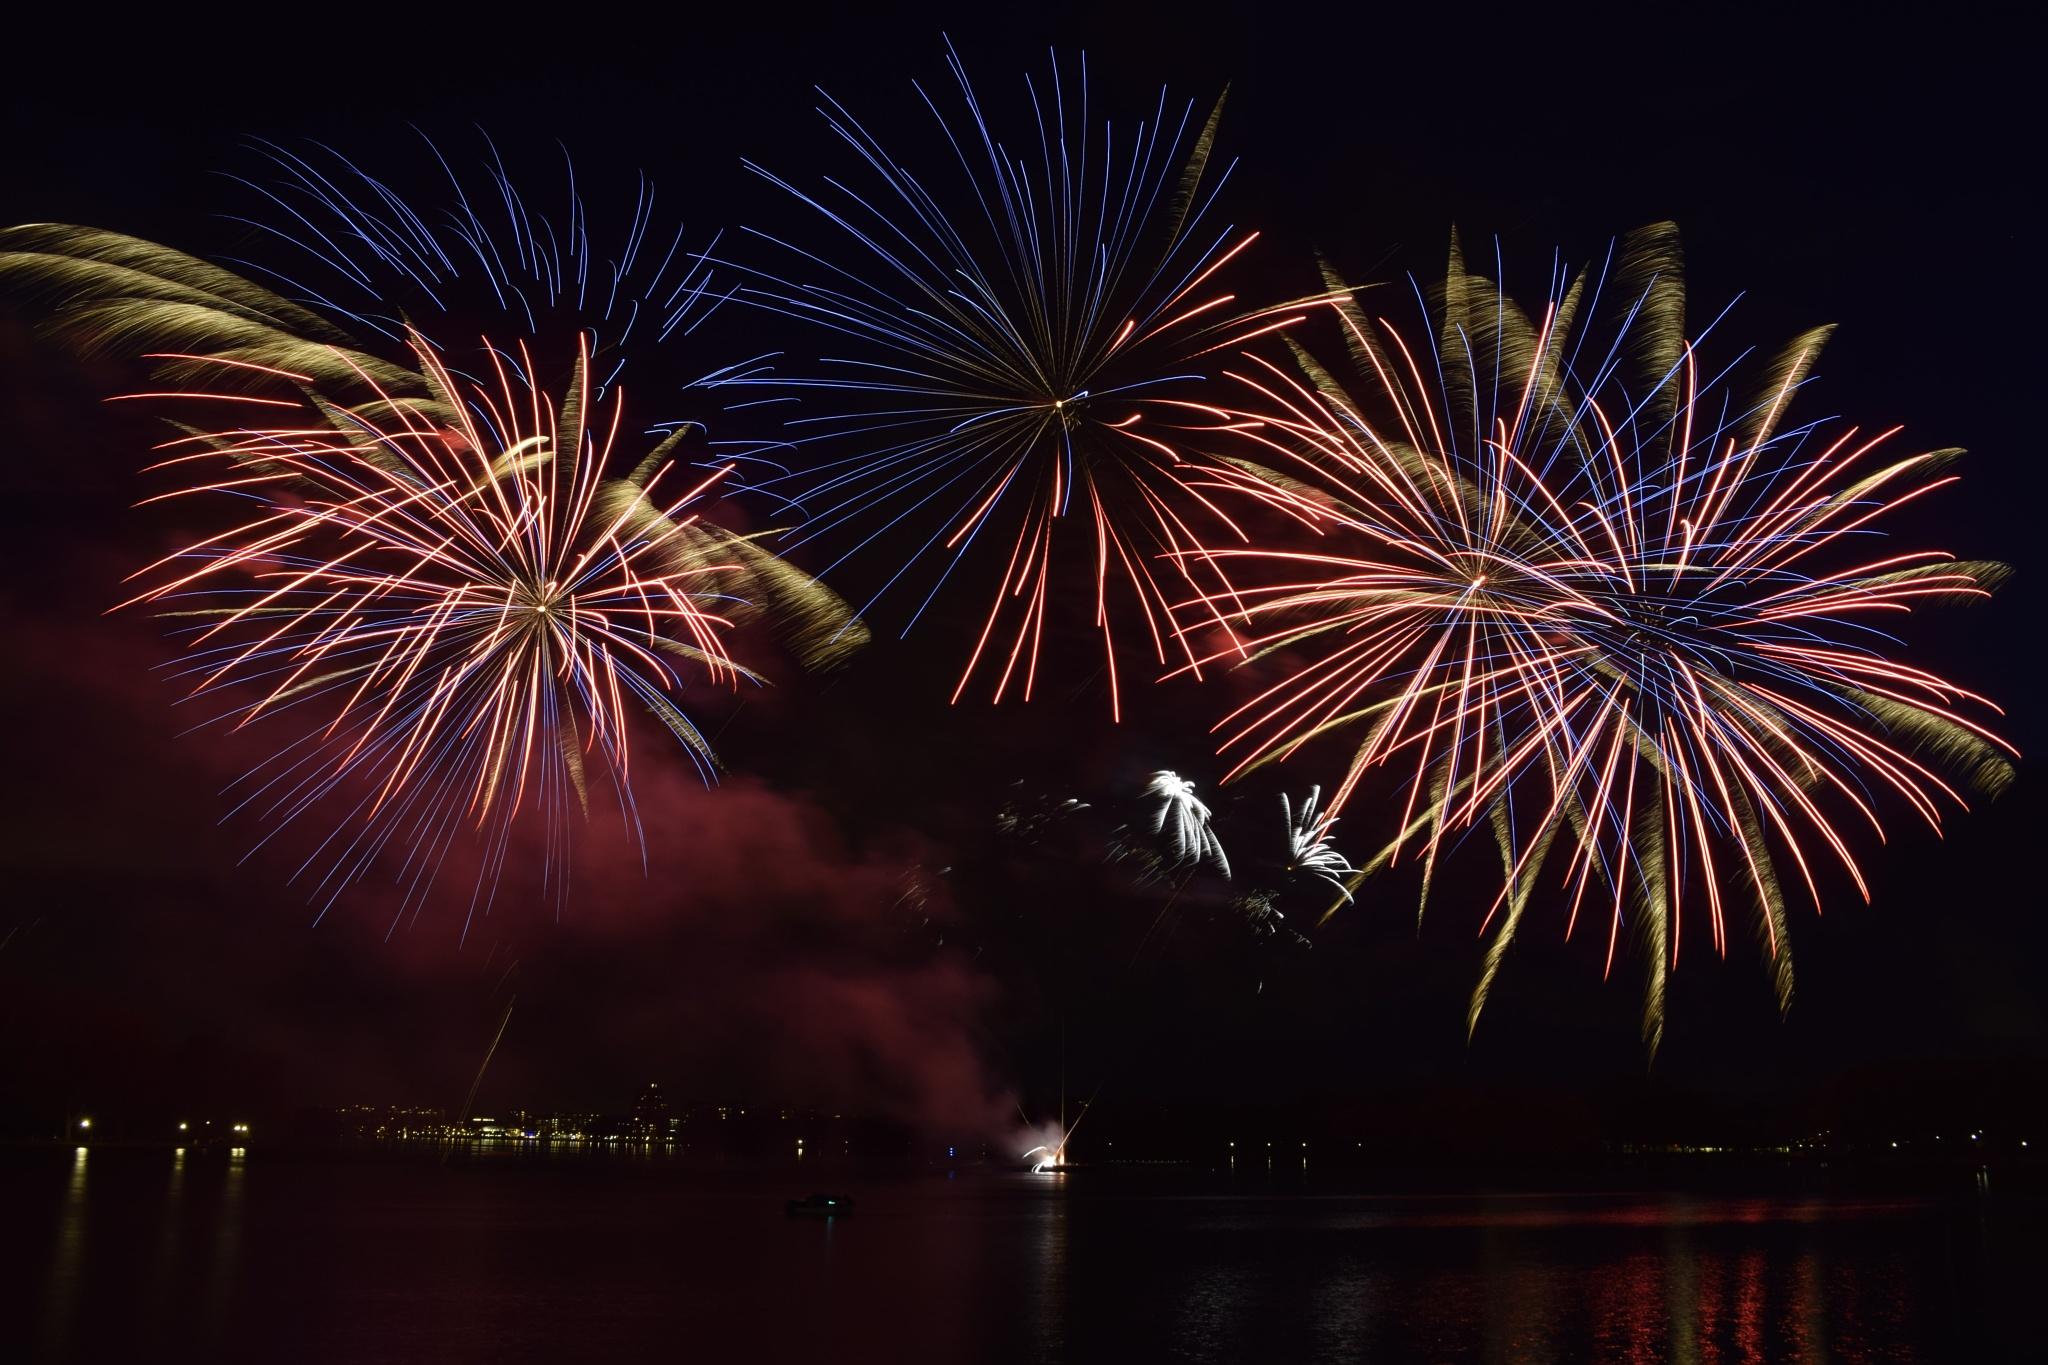 Fireworks in Amsterdam by Cynthia Melissa